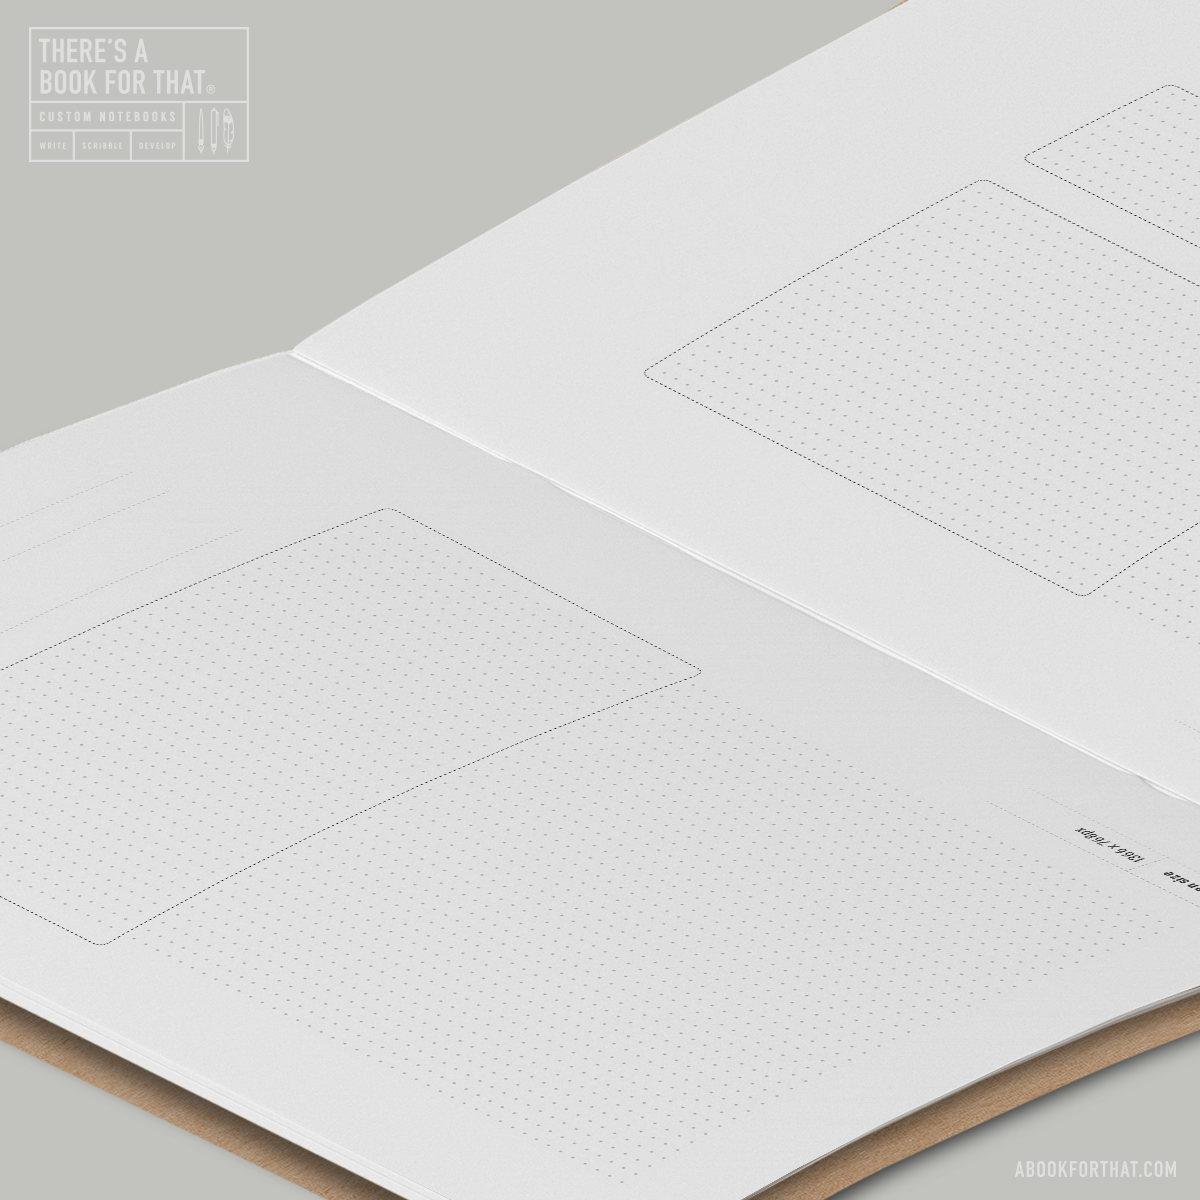 B-114_Screen_Design_Stationery_Notebook_Details1